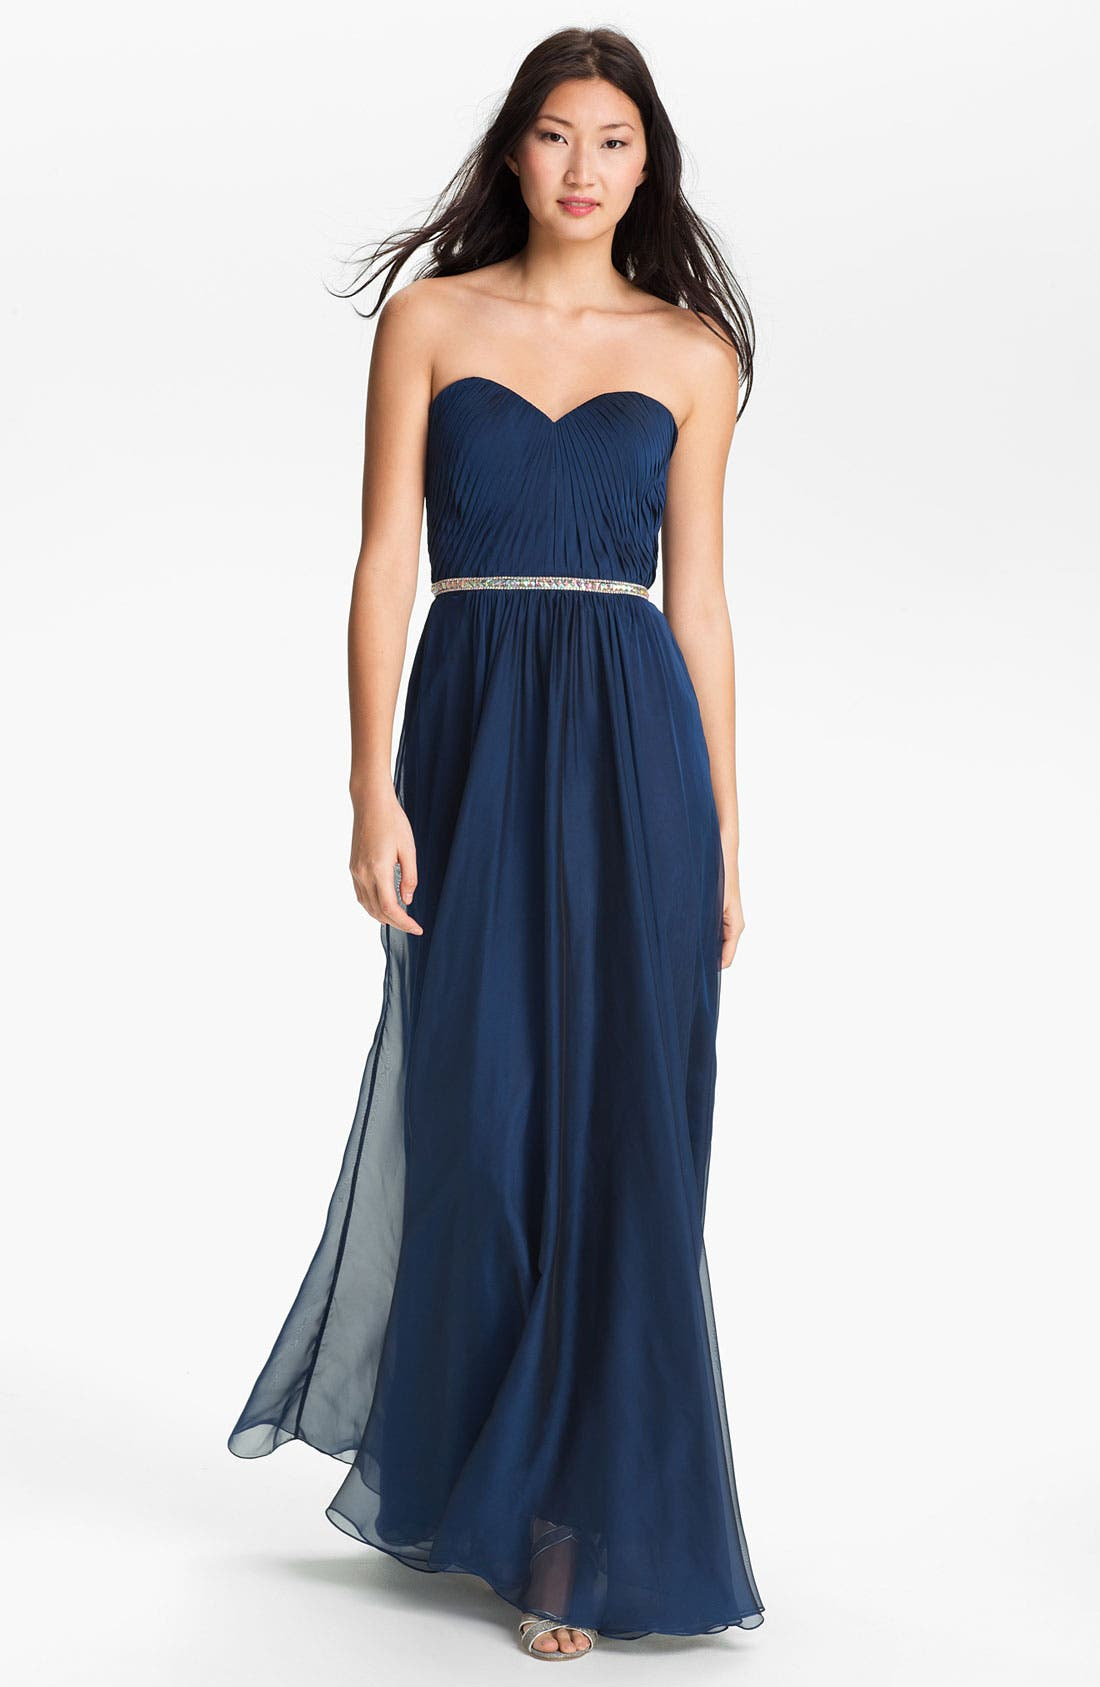 Main Image - La Femme Embellished Chiffon Strapless Gown